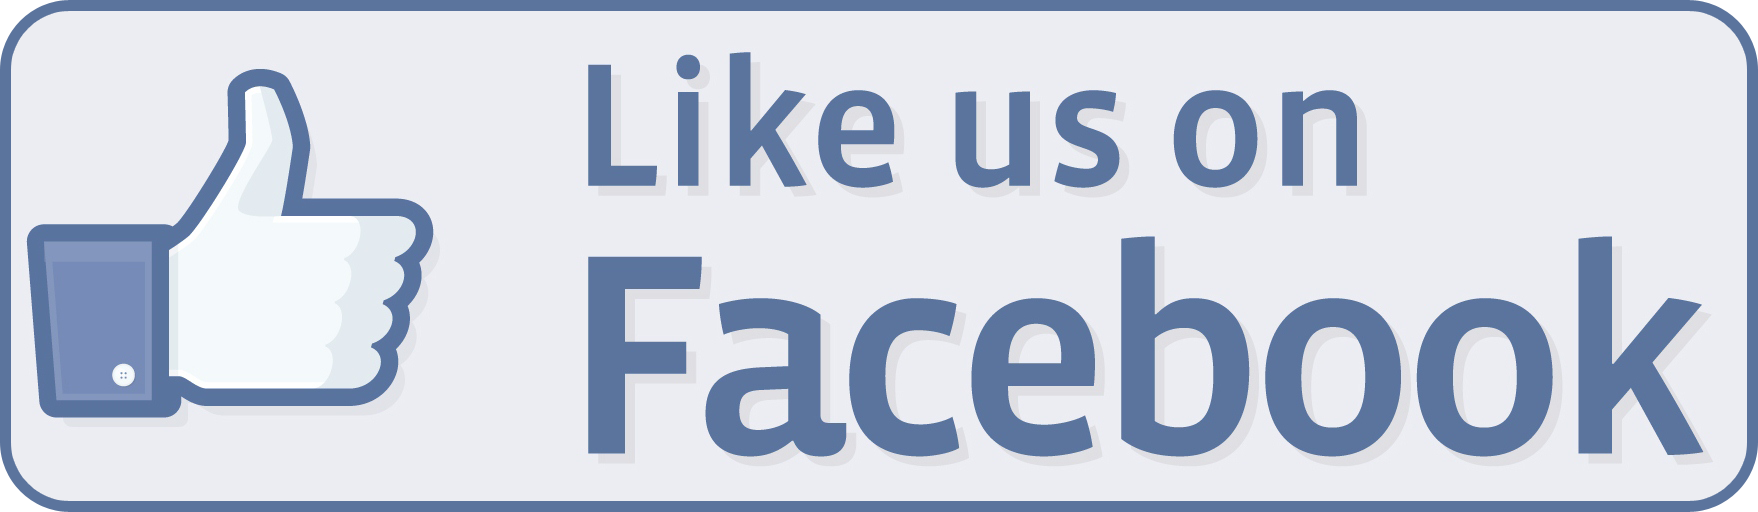 FB-like thumb.jpeg